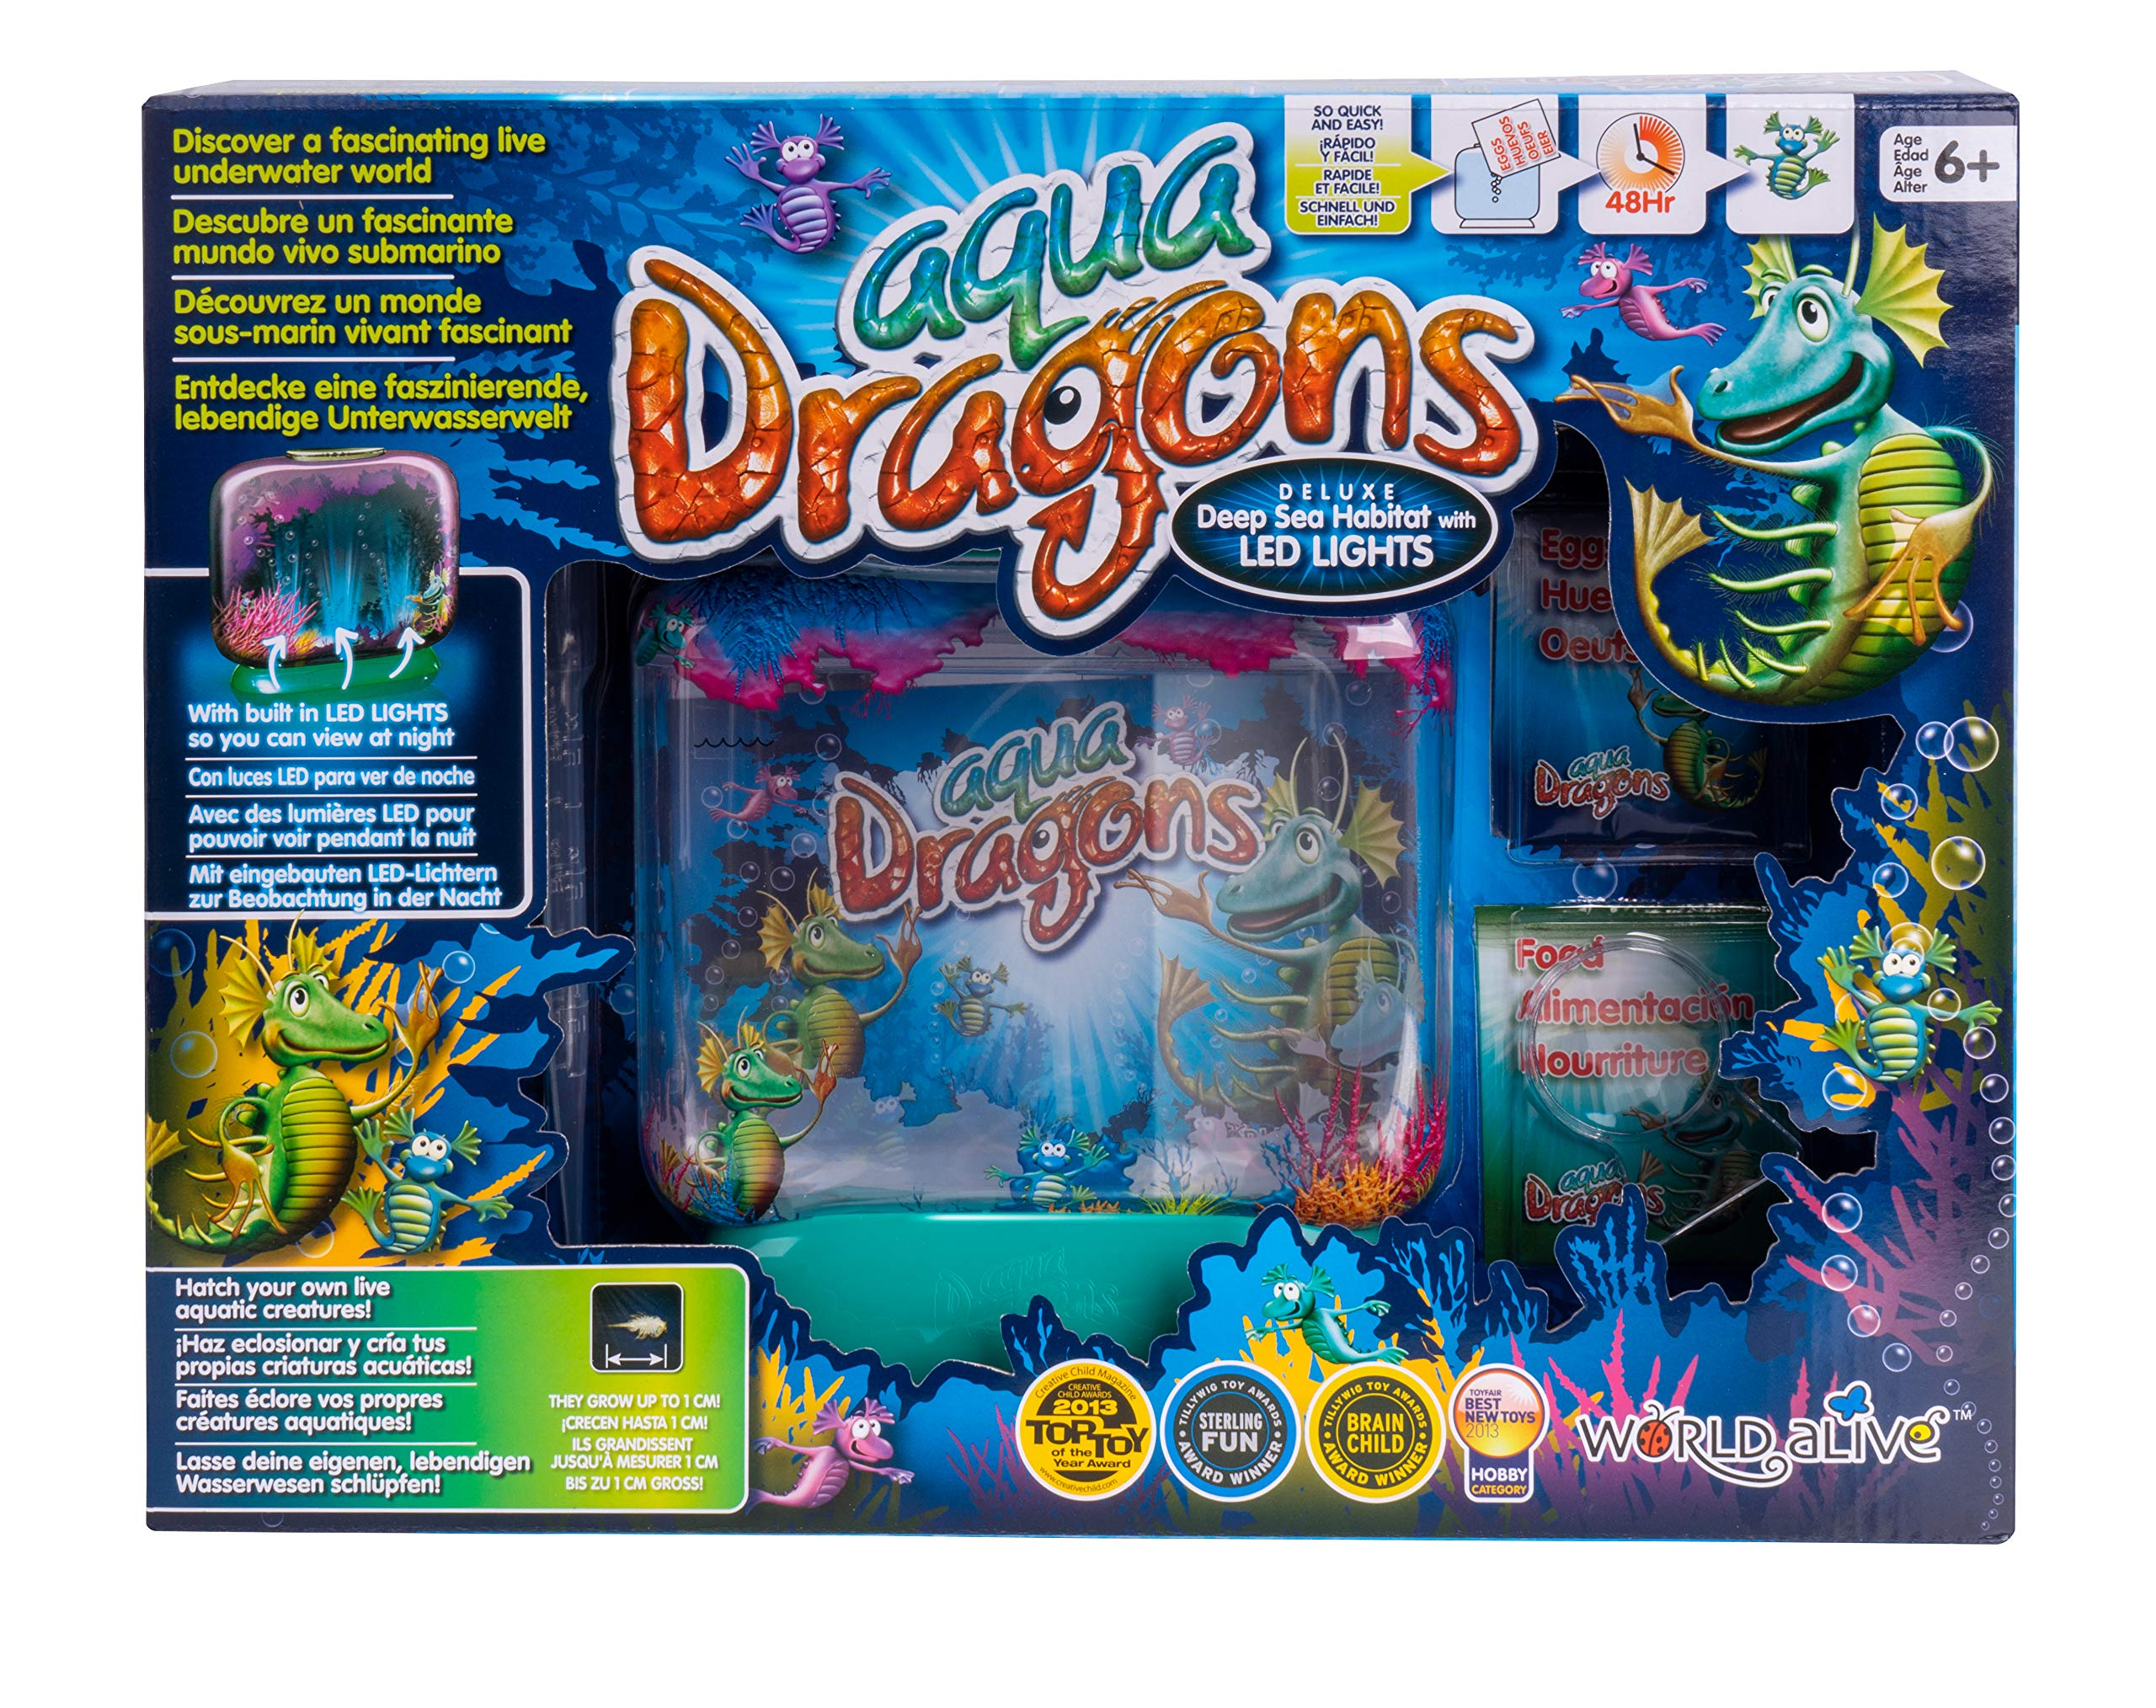 World Alive Aqua Dragons Deluxe Deep Sea Habitat with Led Lights Base